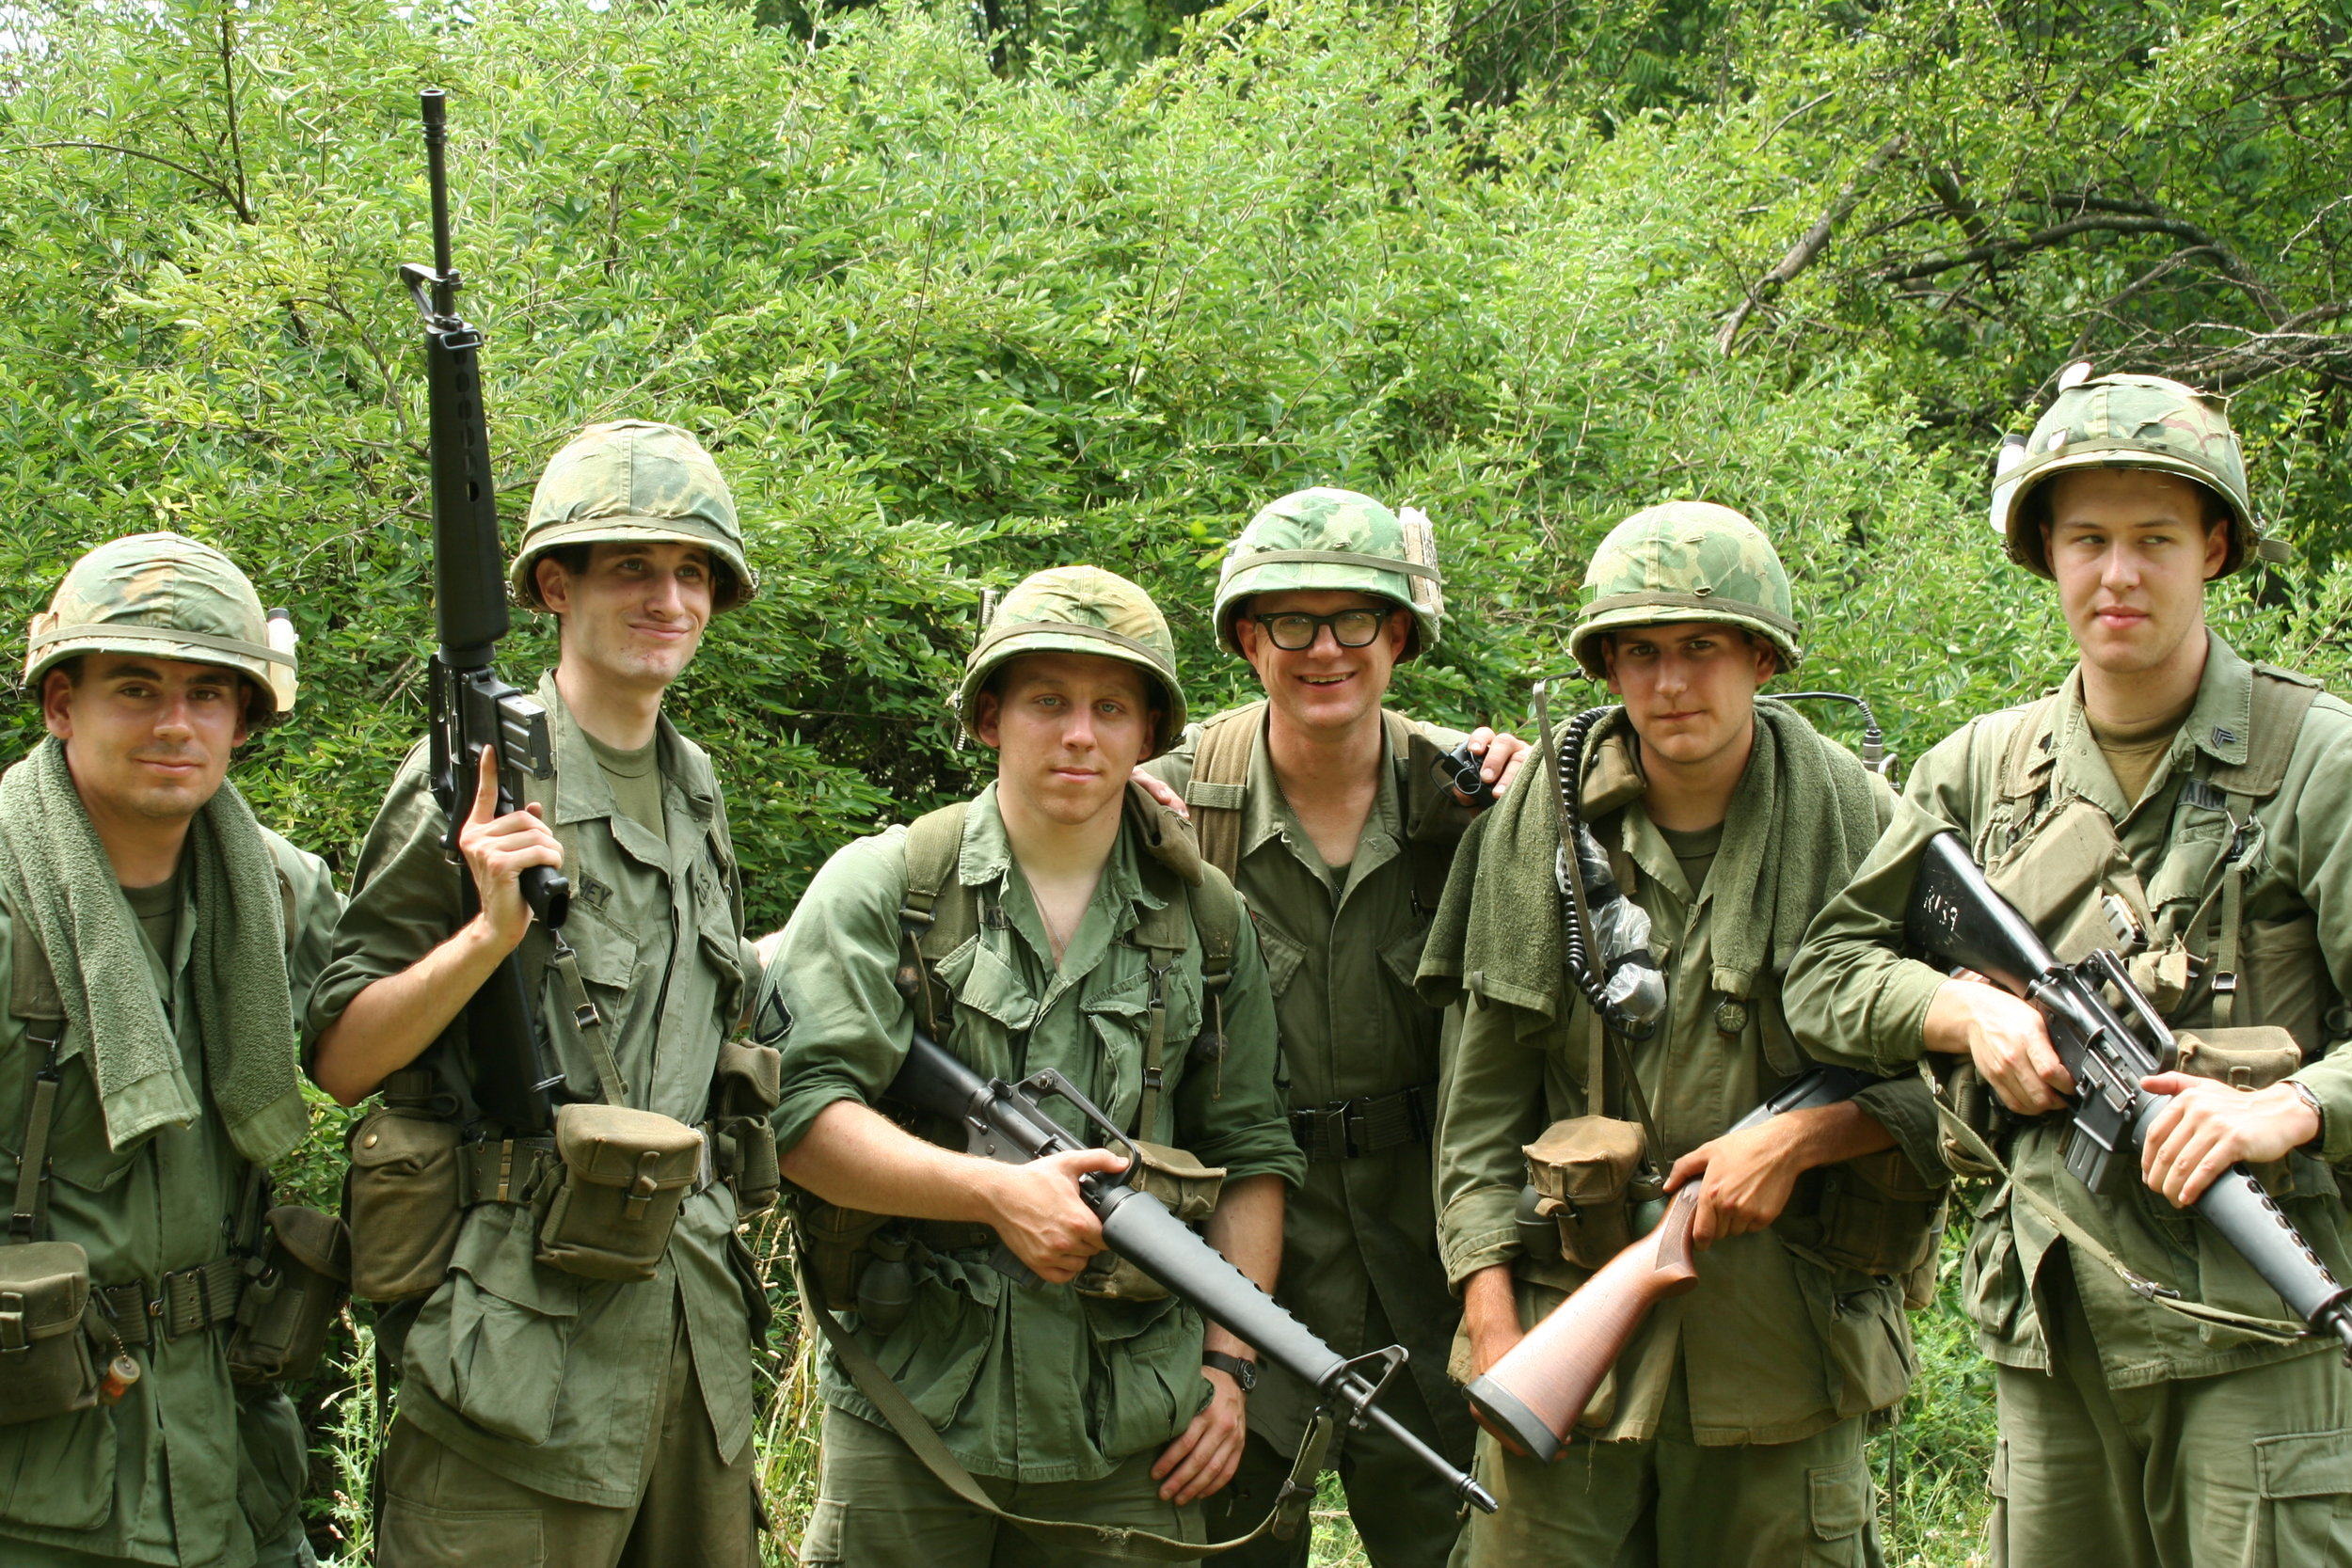 Vietnam Revisited 063 c.2007.jpg